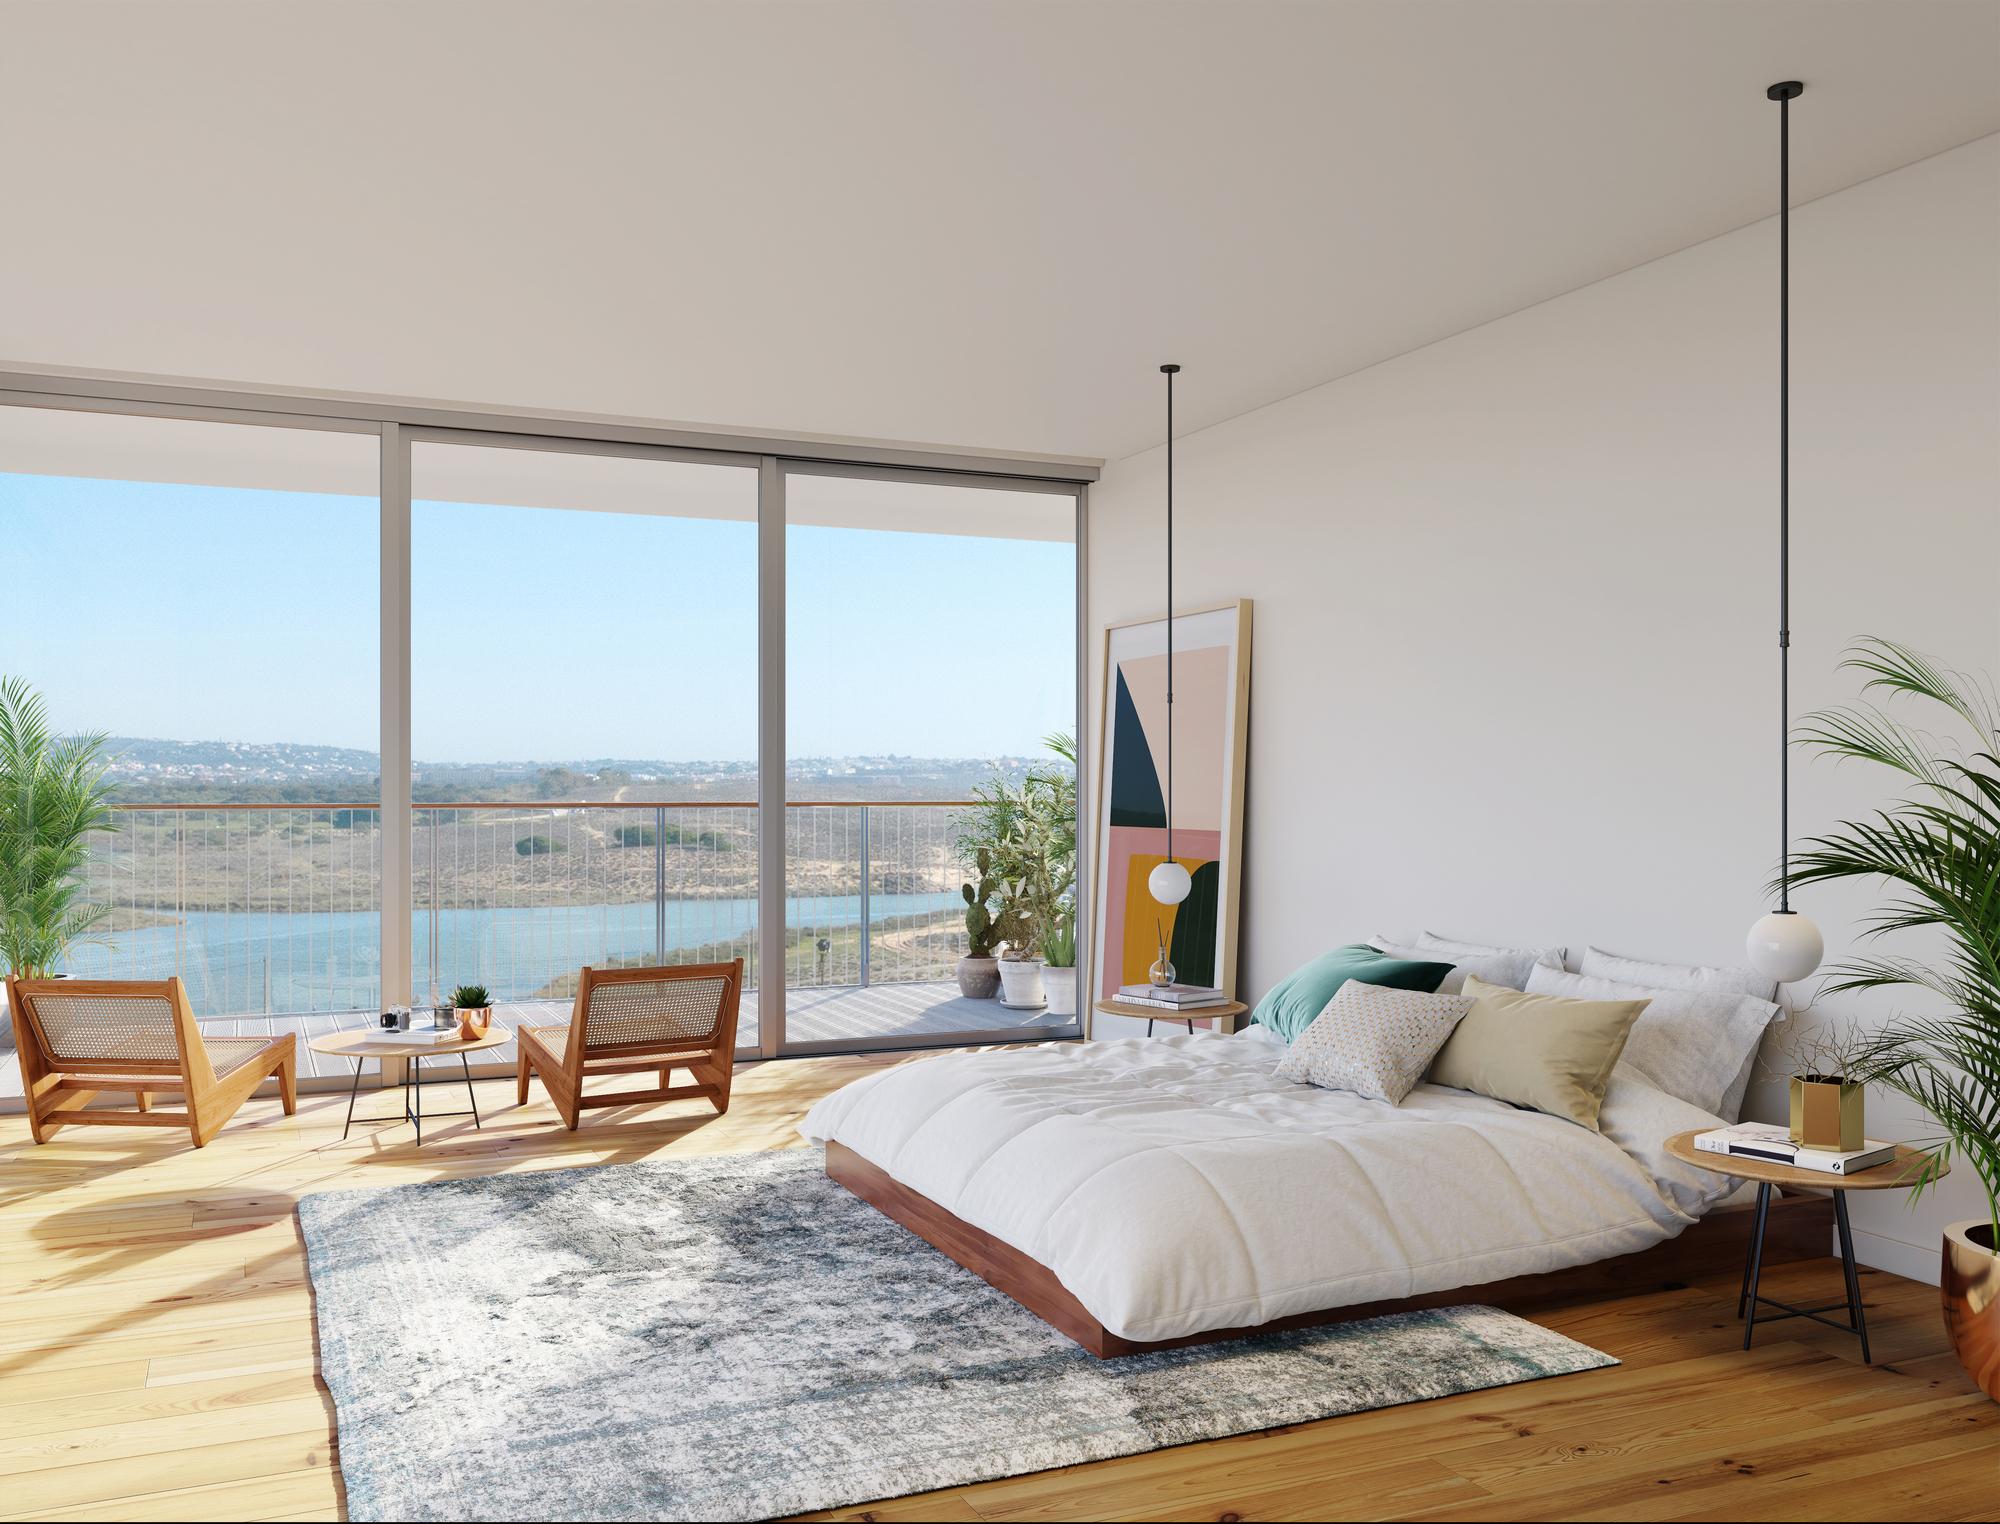 bayline-b1-p5-bedroom